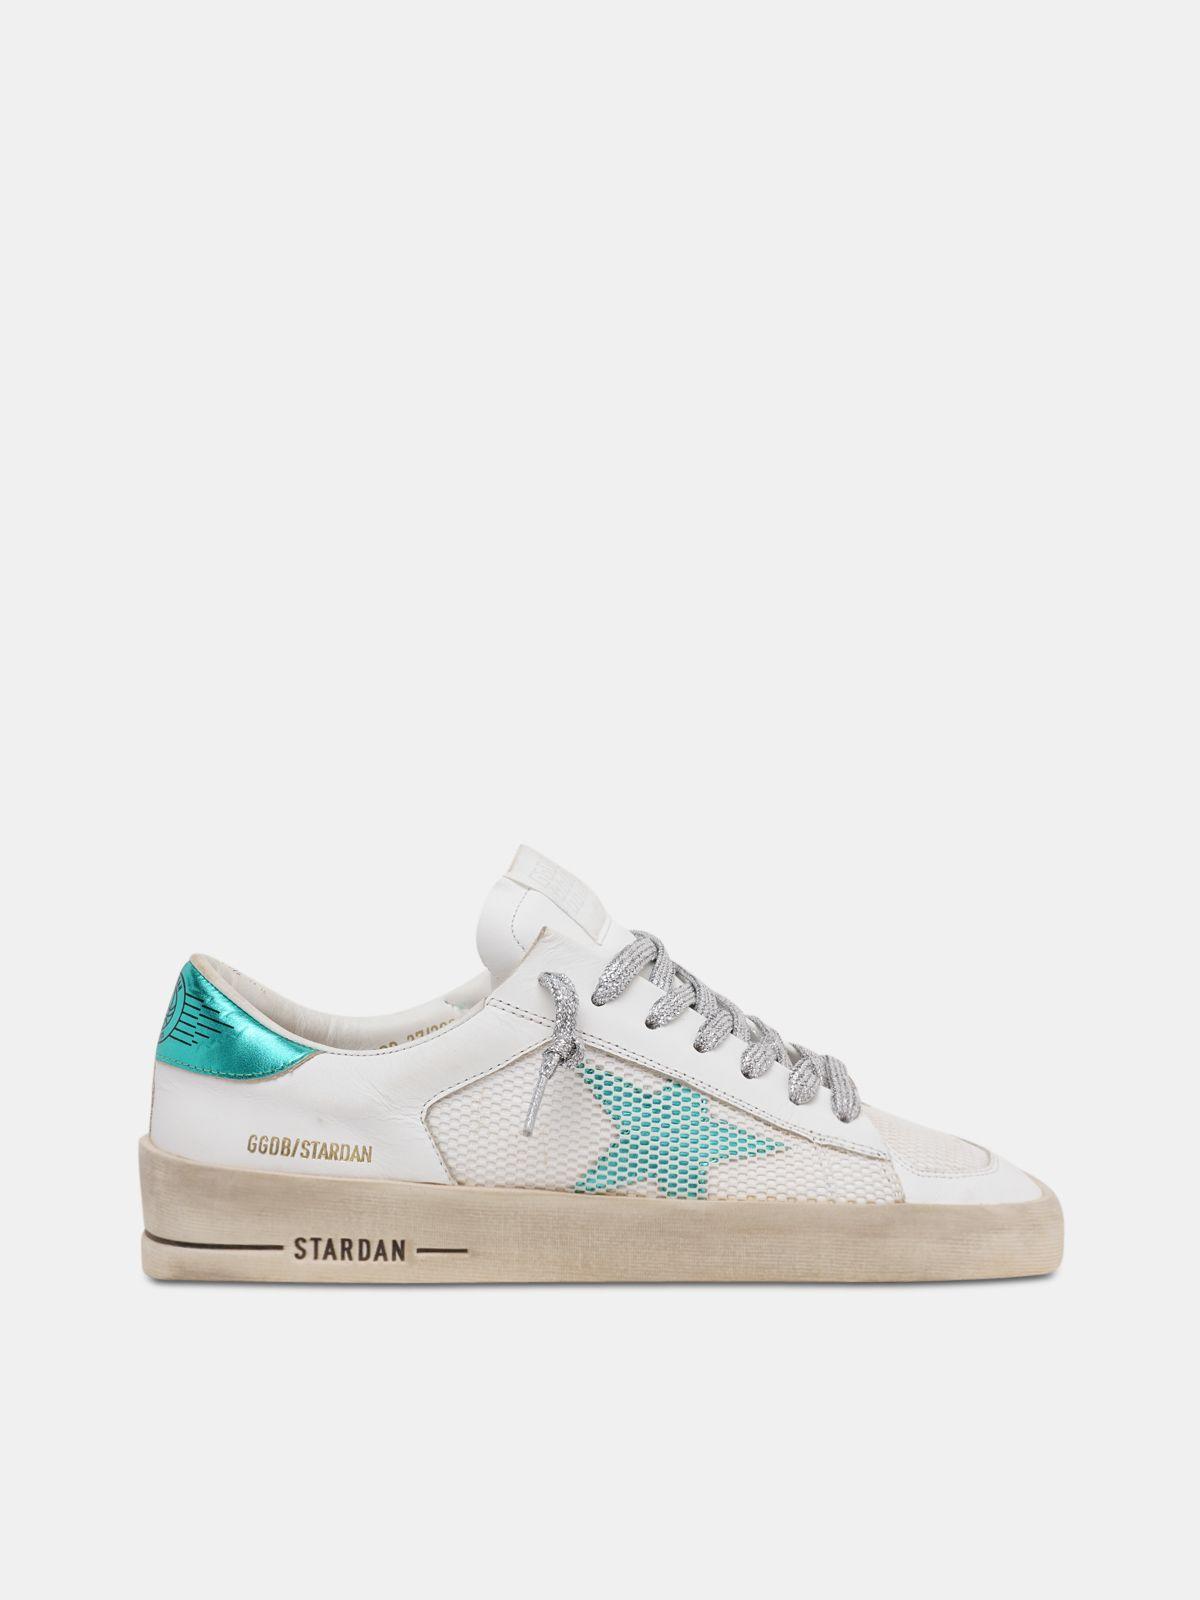 White and aqua-green Stardan sneakers